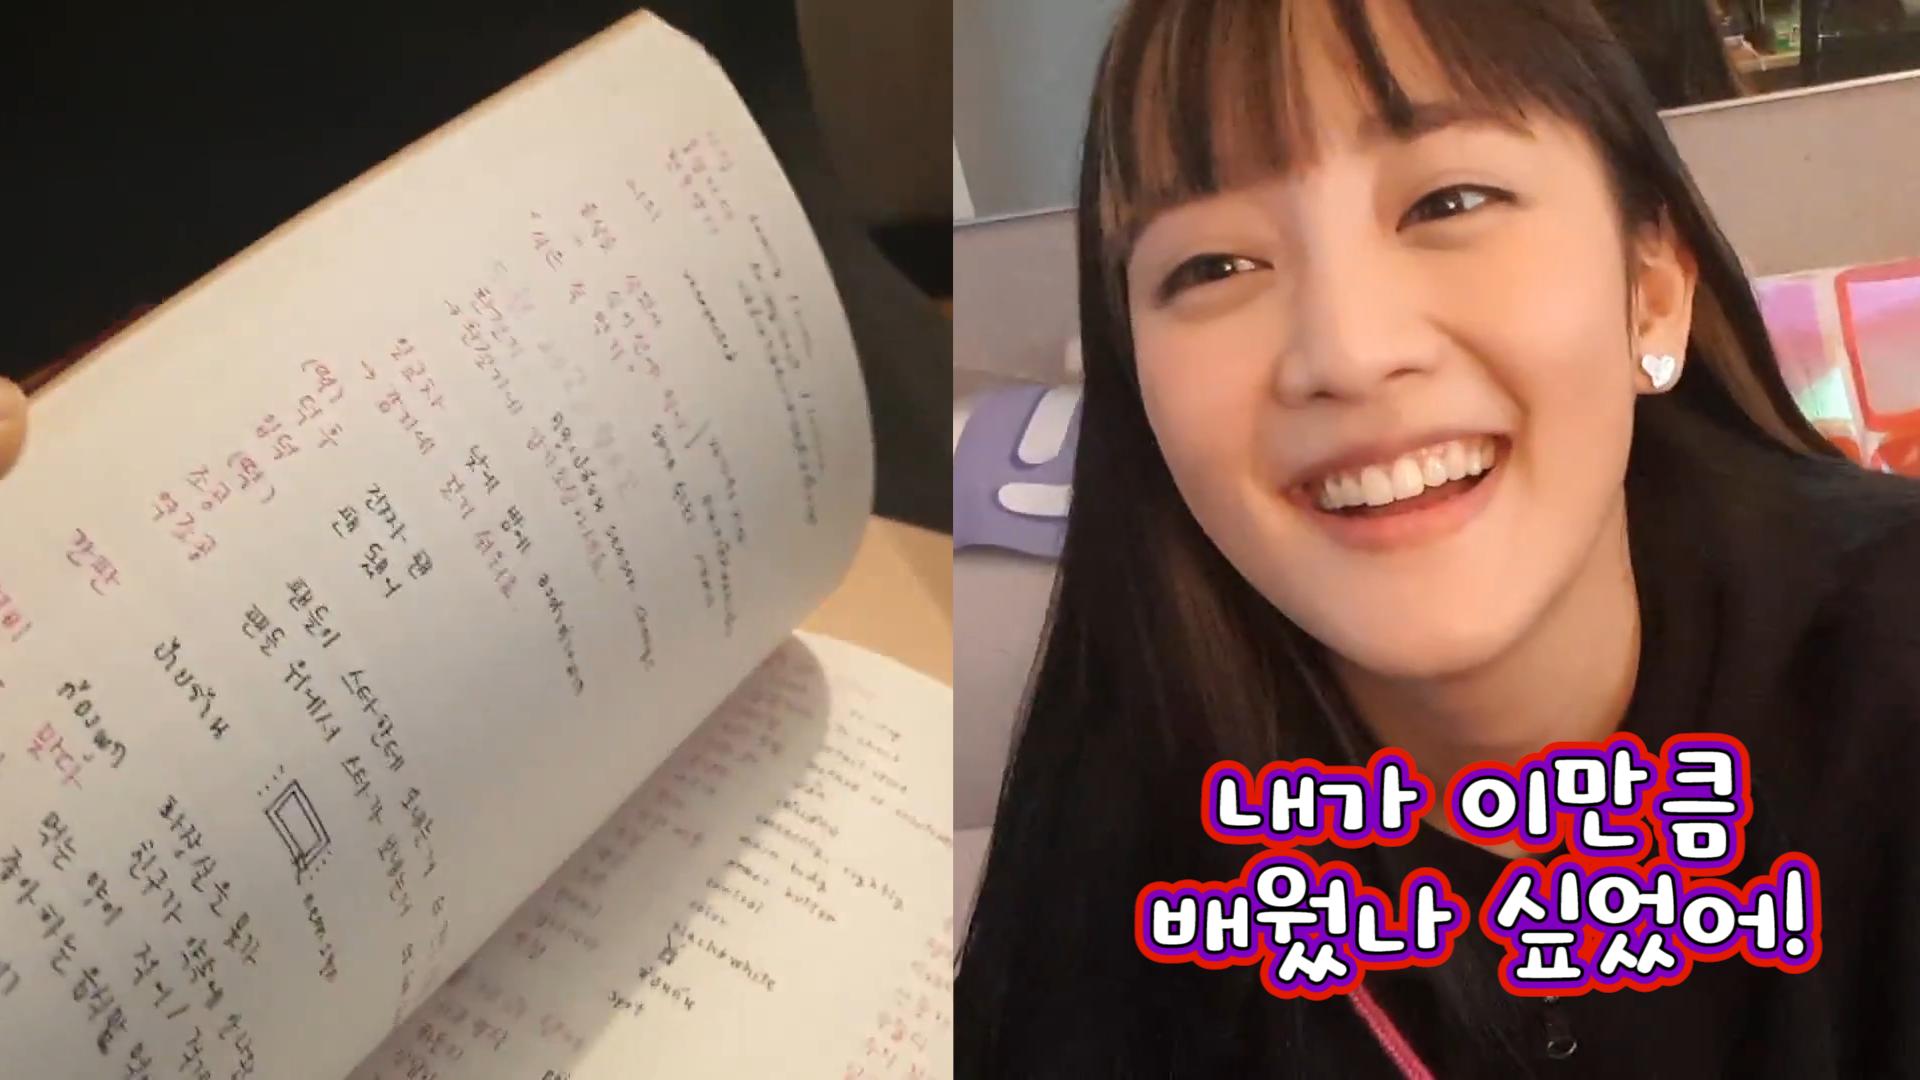 [(G)I-DLE] 공부는 김민니처럼.. 그럼 야 너두 언어천재 될 수 있어👍 (MINNIE showing her Korean study notes)